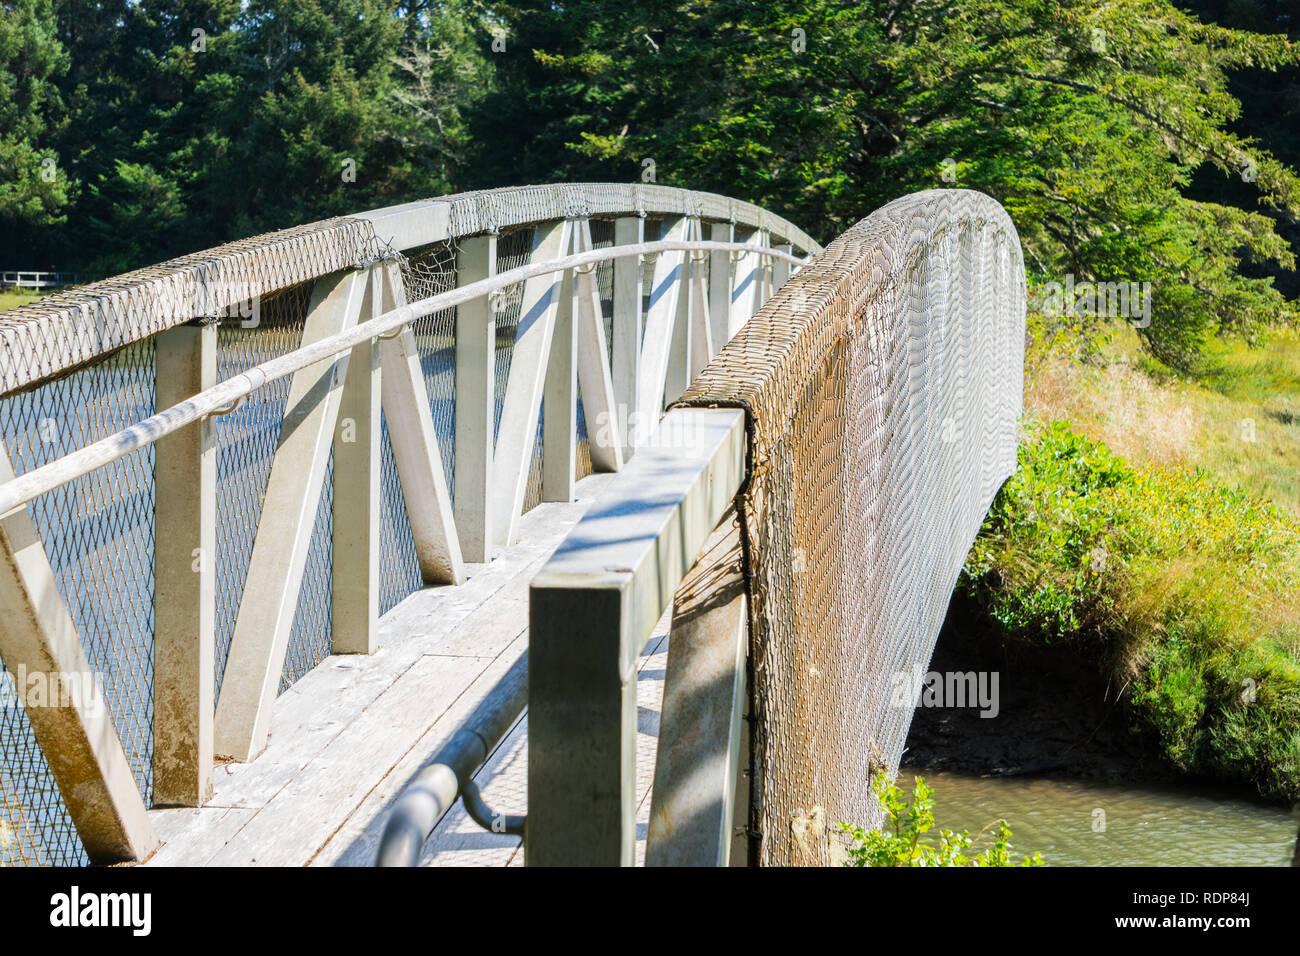 White wooden bridge, South Slough National Estuarine Research Reserve, Coos Bay, Oregon - Stock Image